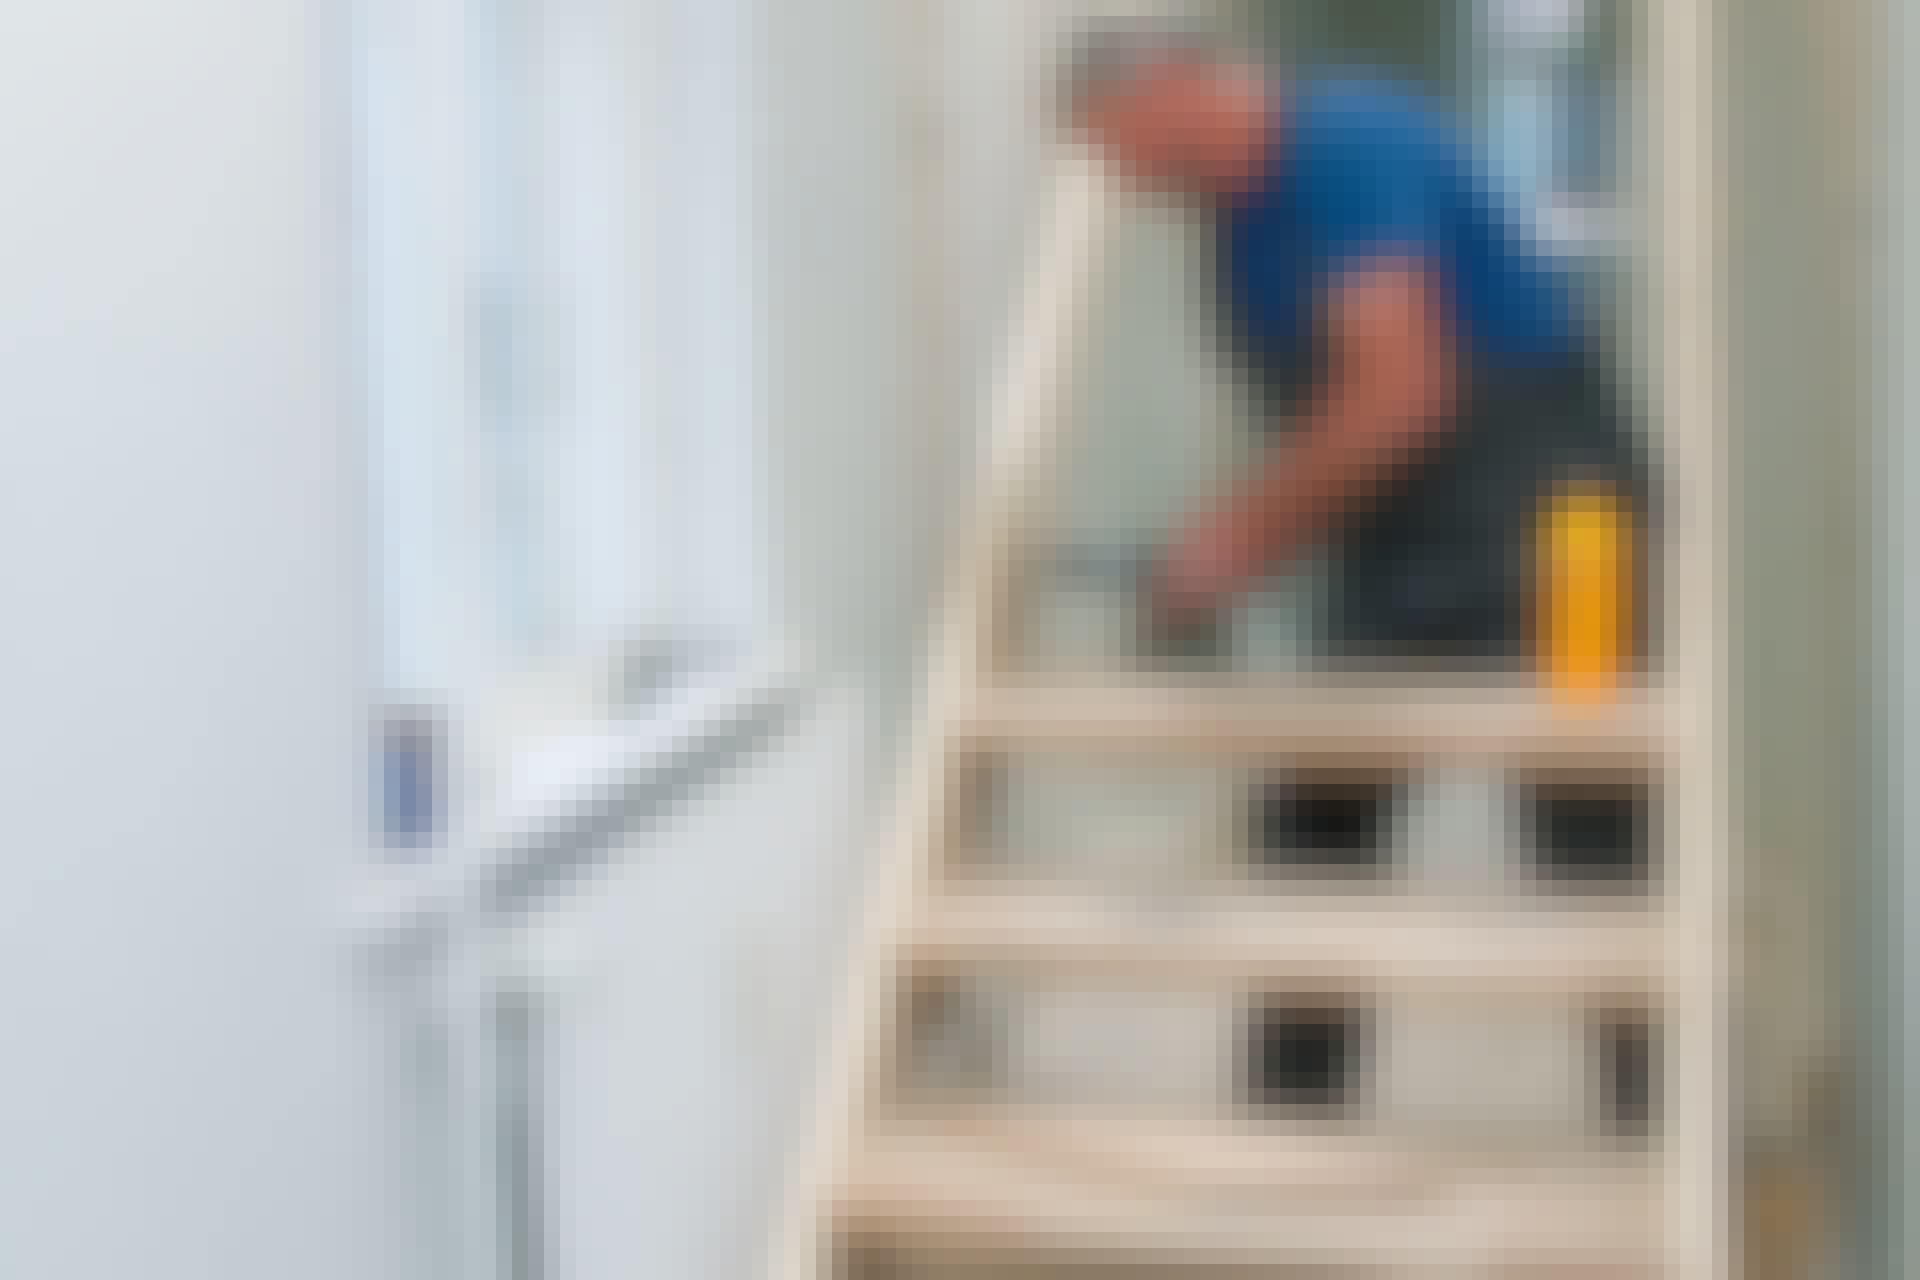 Steghöjd trappa: Hur brant ska trappan vara?1